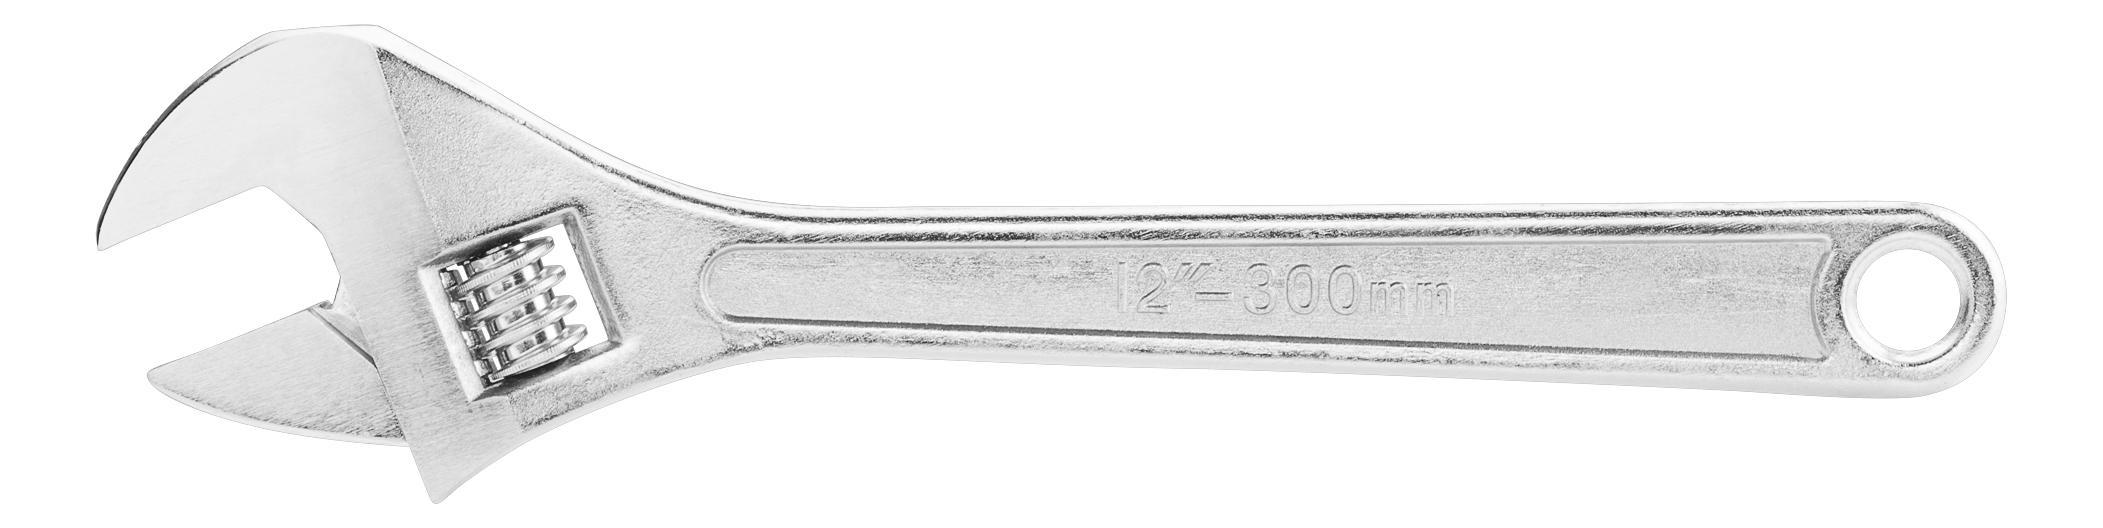 Ключ Top tools 35d114